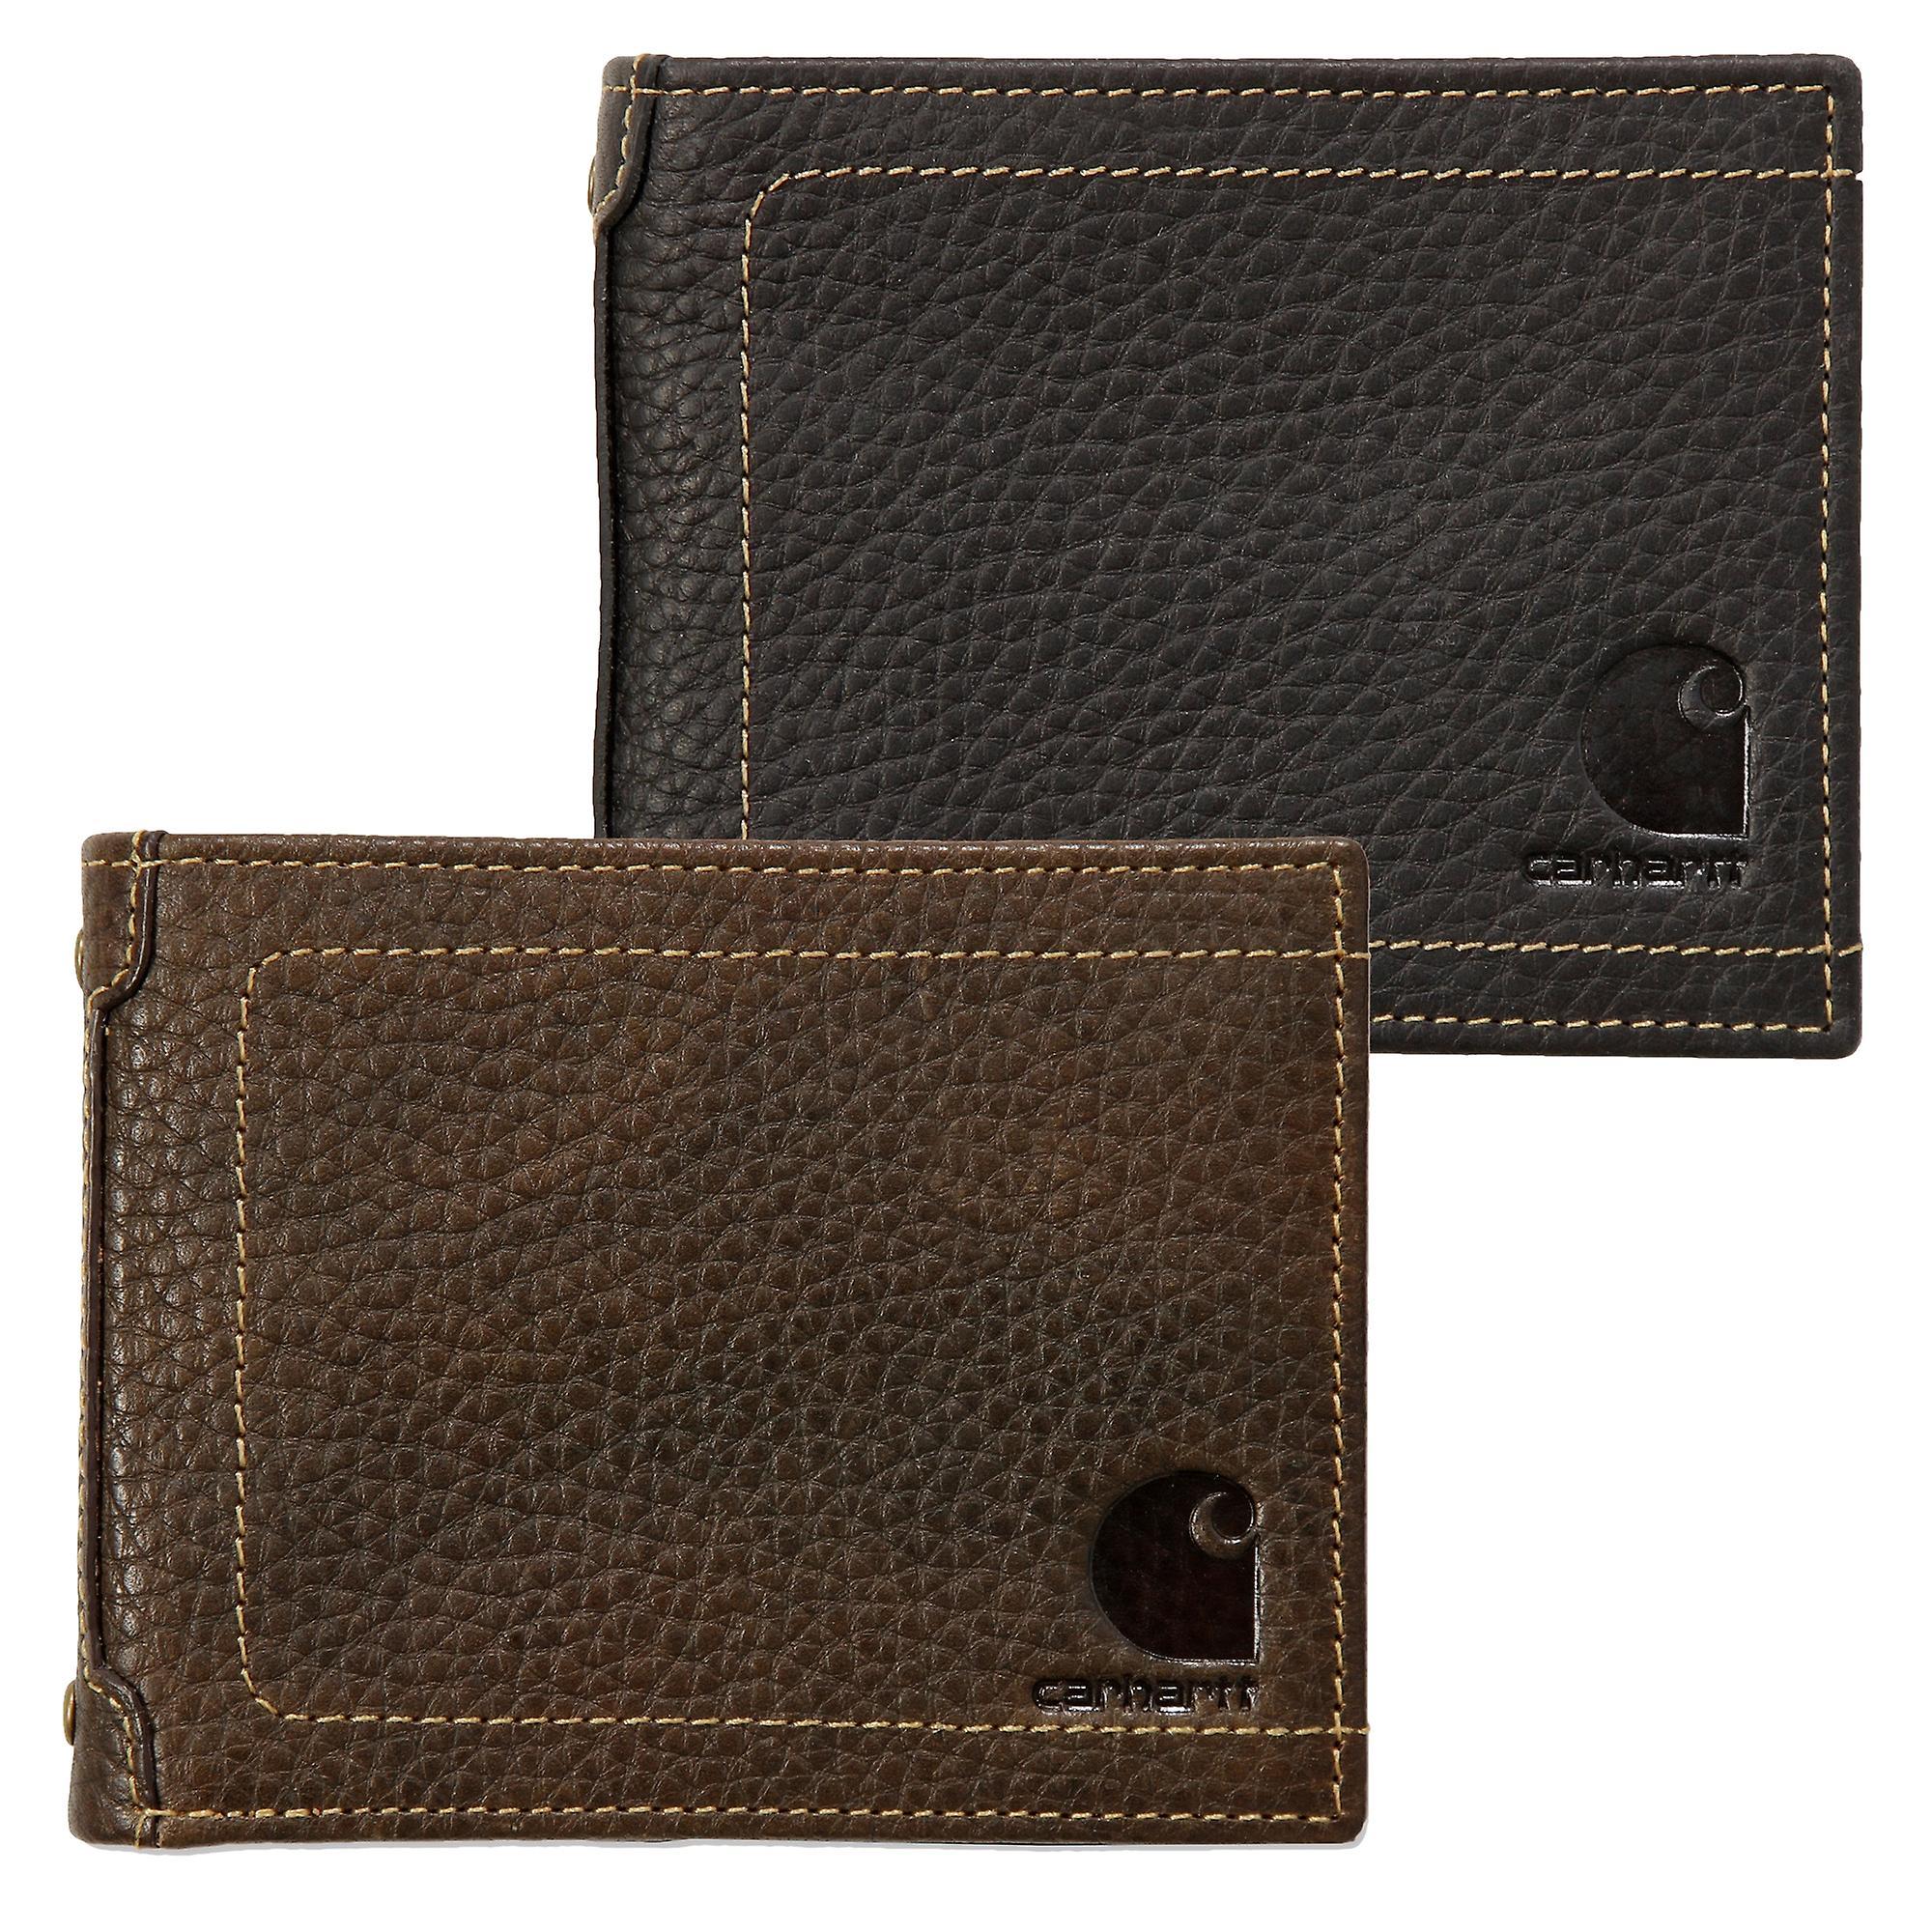 b3d82118d4d0b Carhartt unisex Pebble zip wallet Bifold portfel   Fruugo